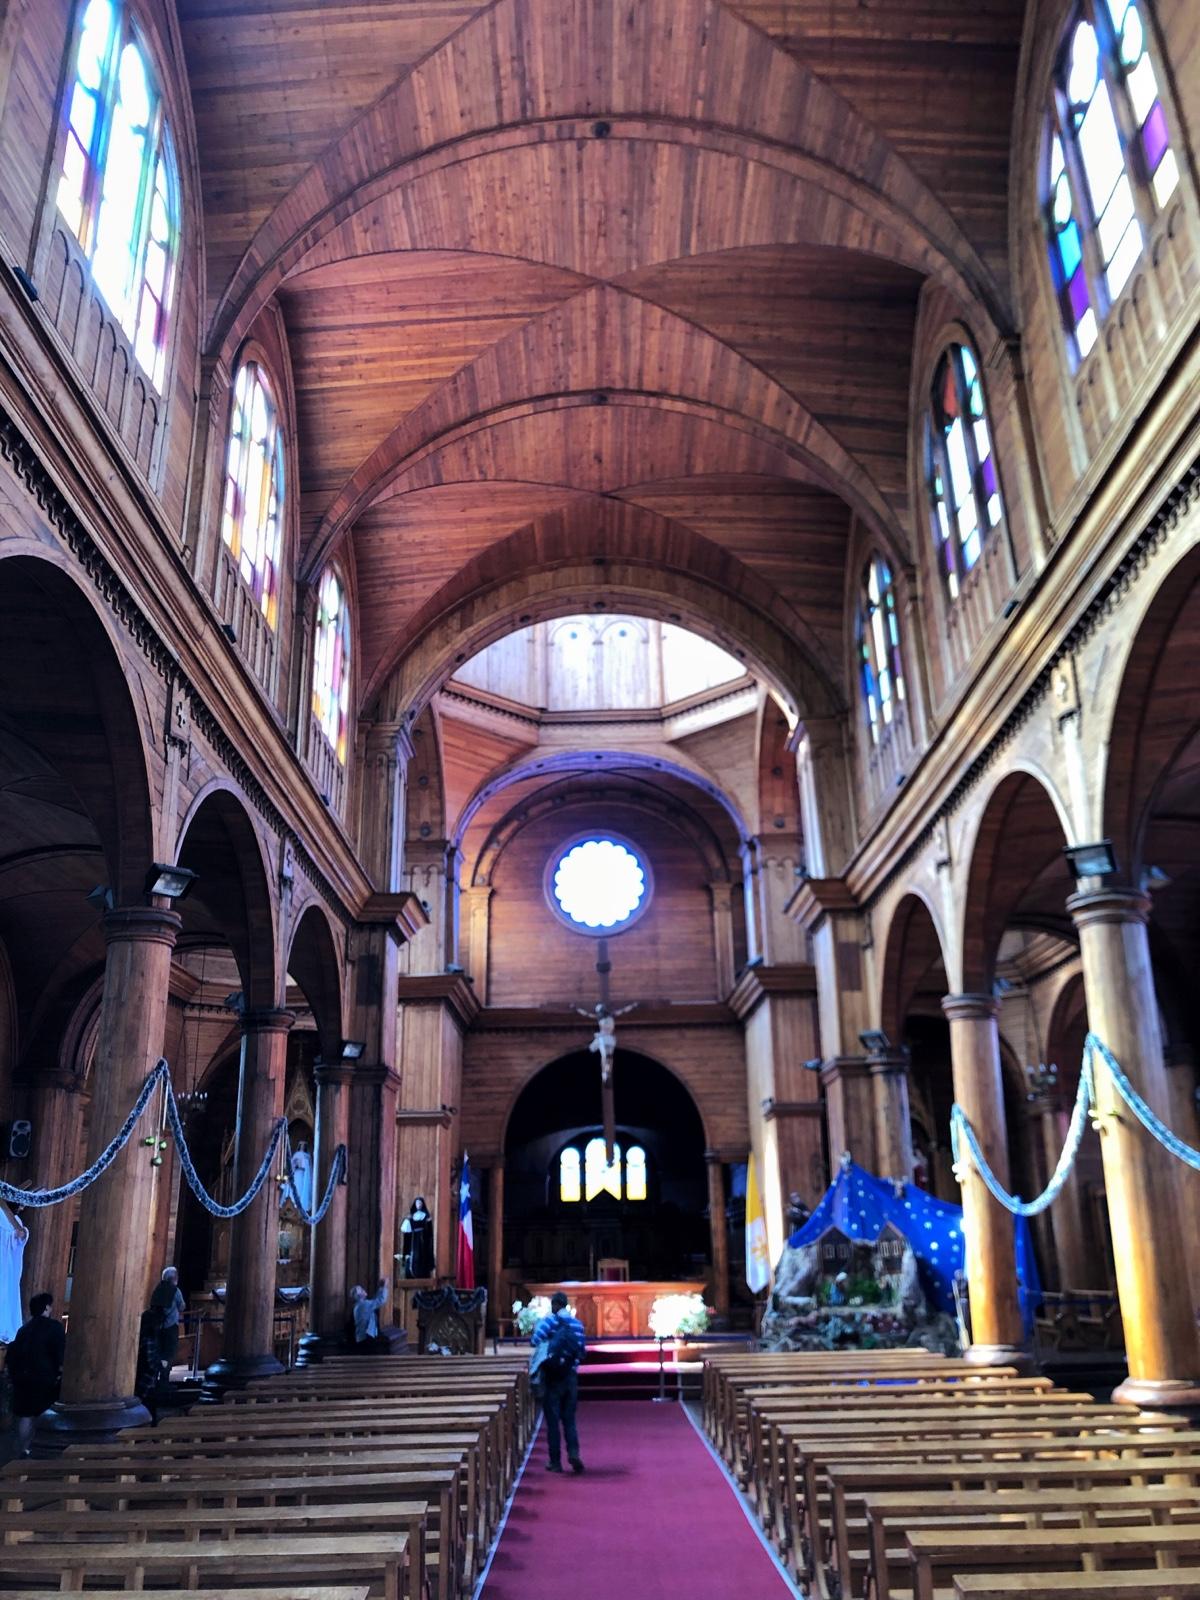 Innenraum der Kirche. Man beachte das viele Holz